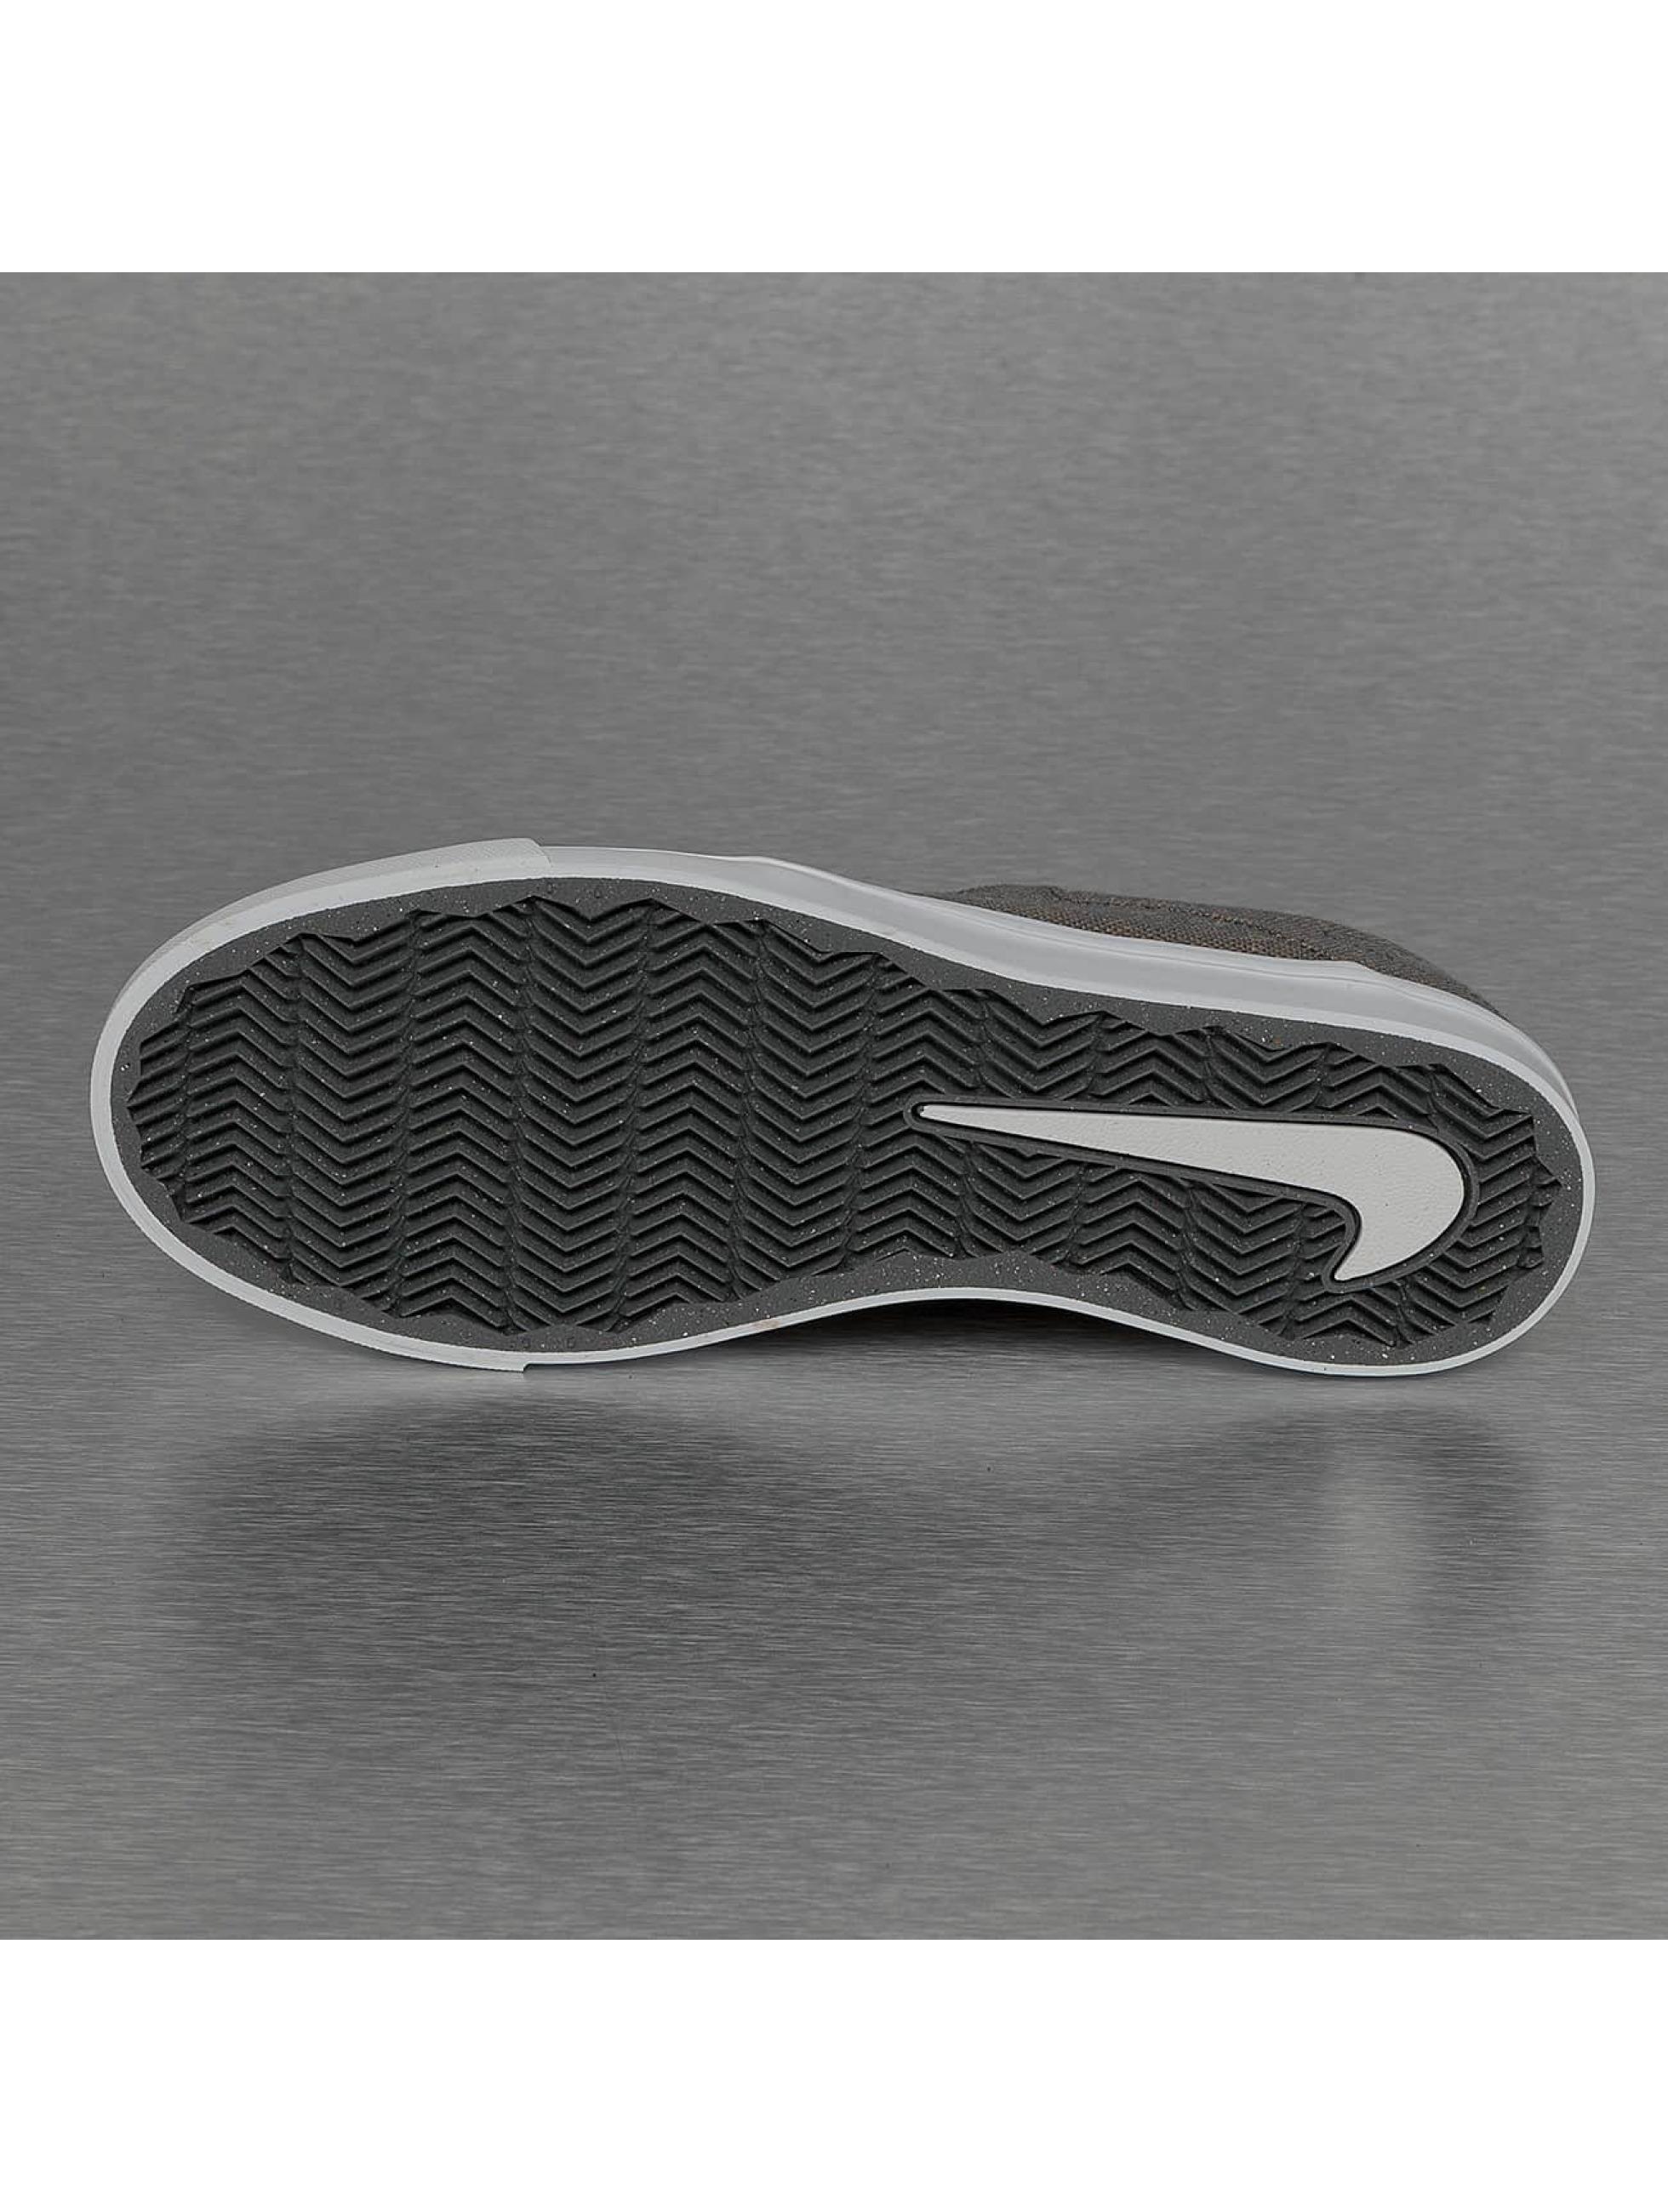 nik air max 2014 - Nike SB Chaussures / Baskets SB Portmore Canvas Premium en gris 258042